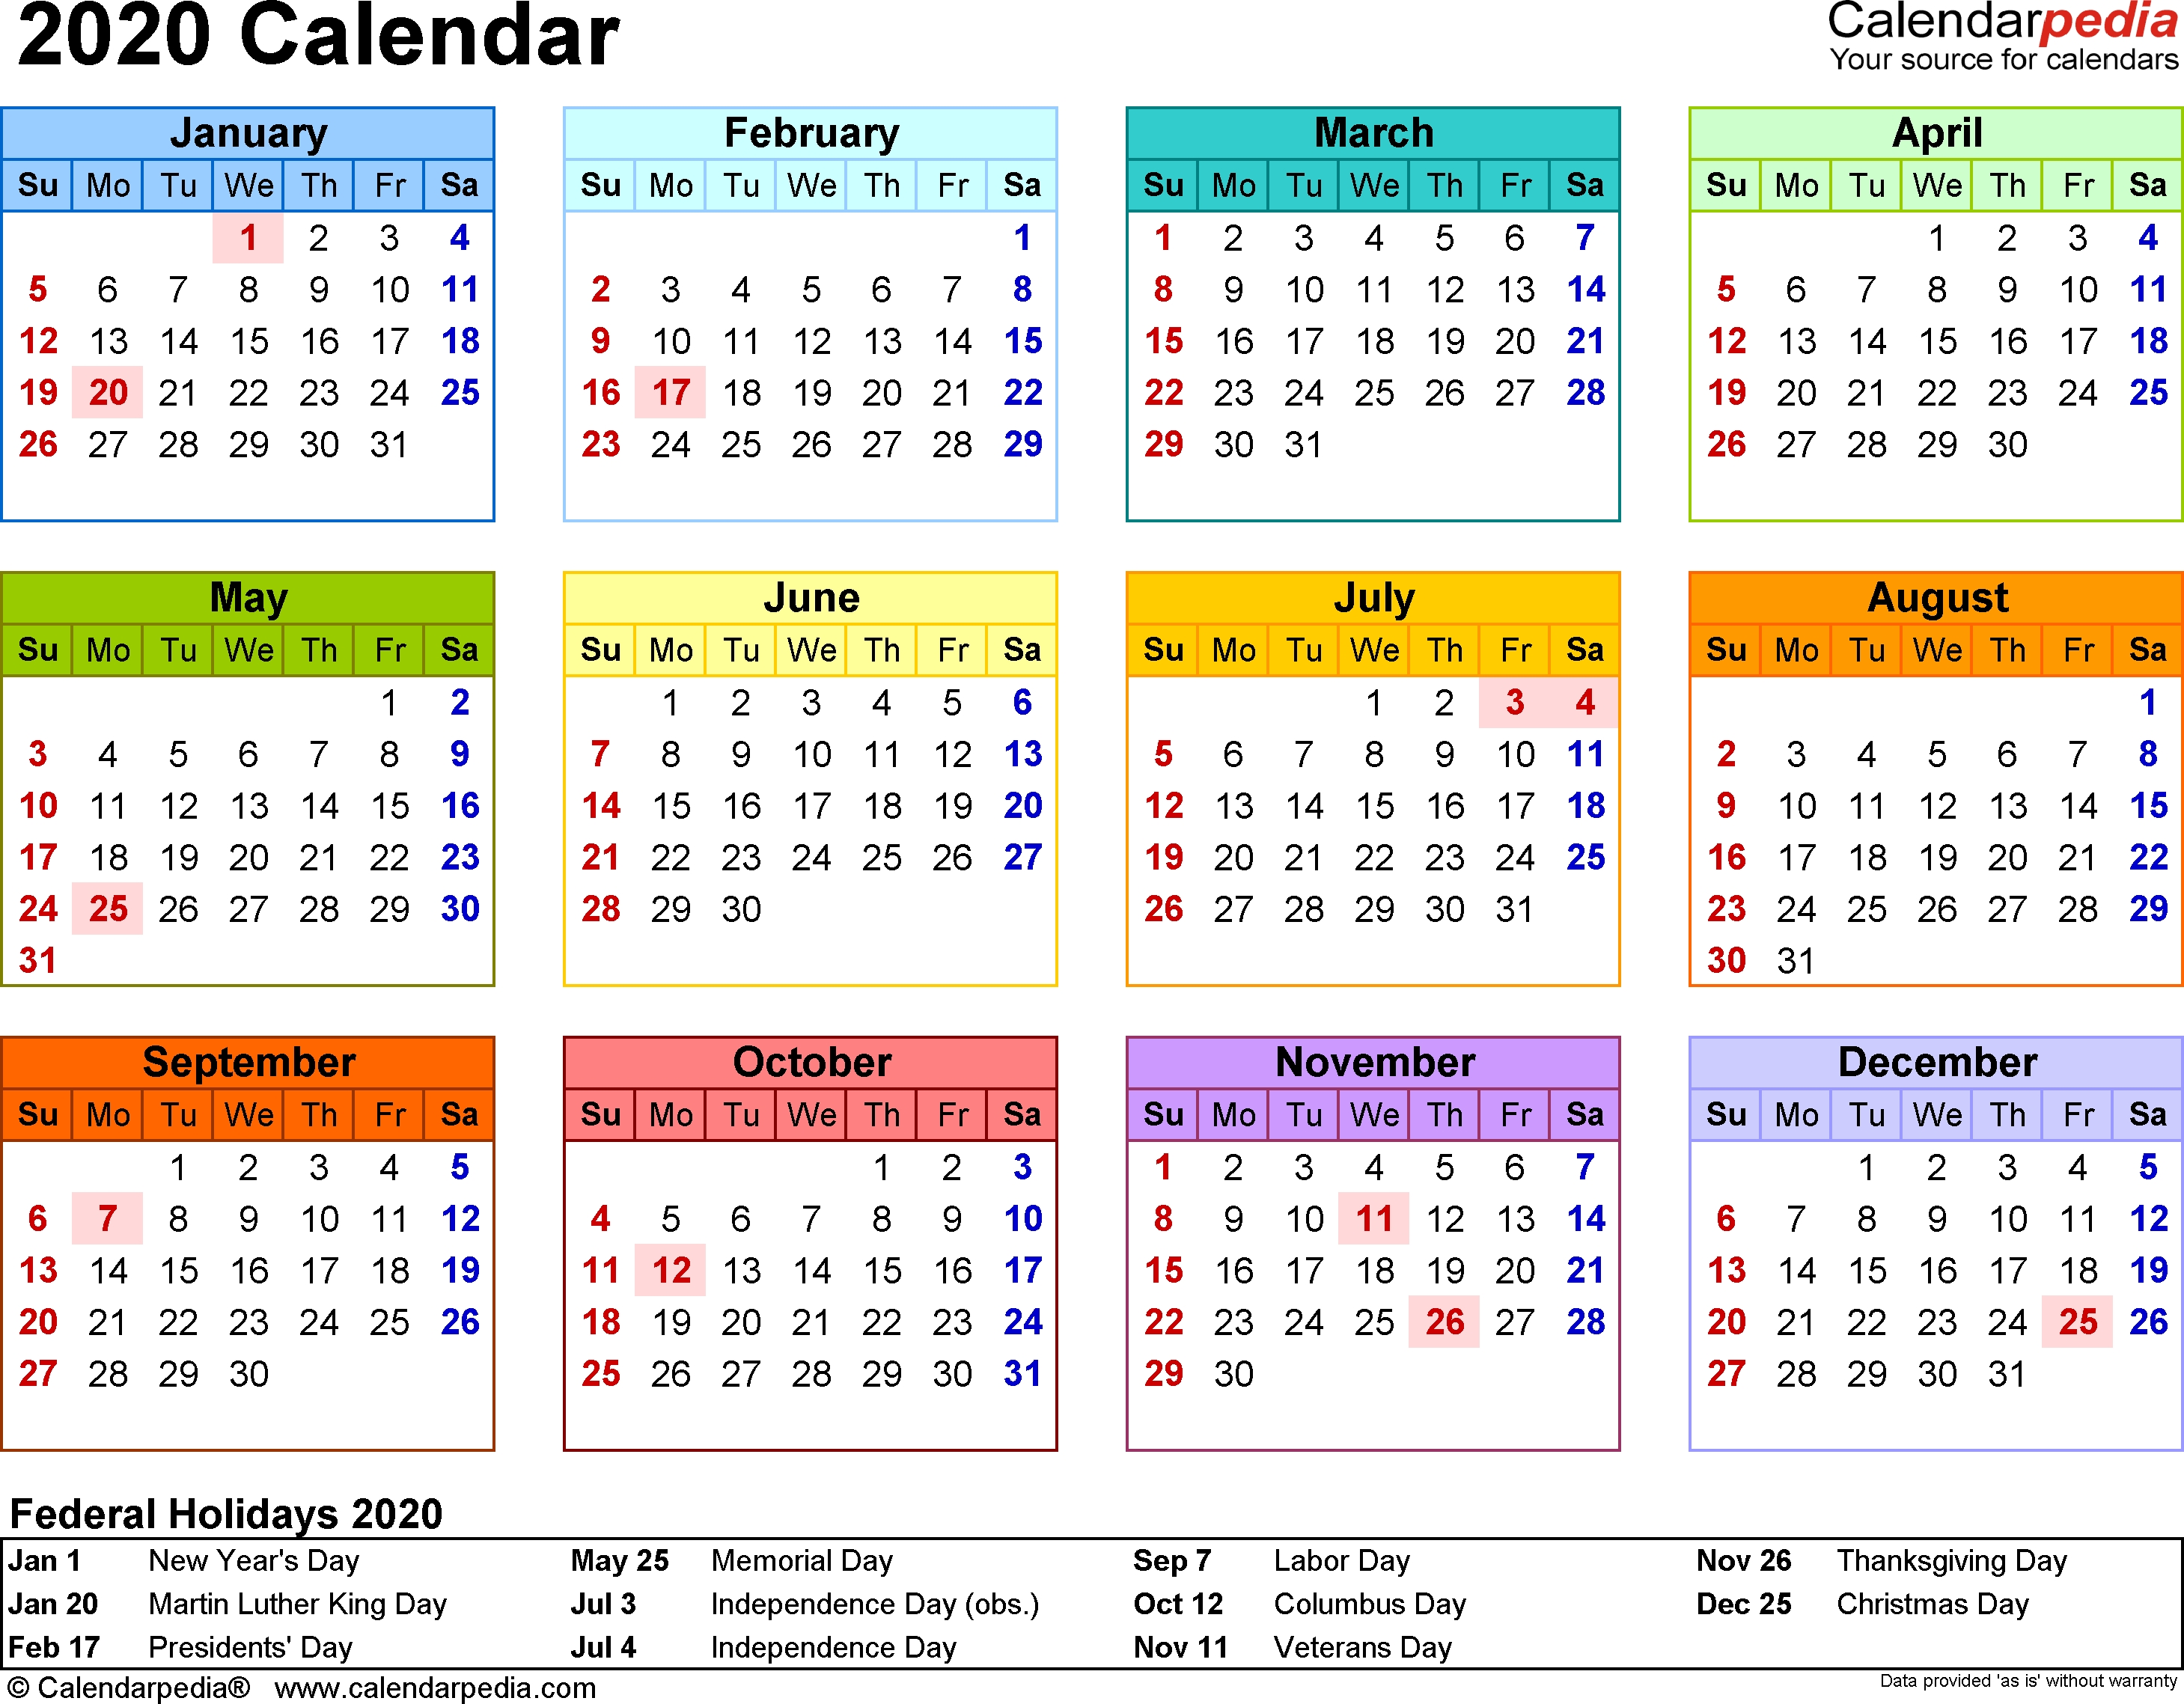 2020 Calendar - Download 17 Free Printable Excel Templates (.xlsx) 2020 Calendar Free Download